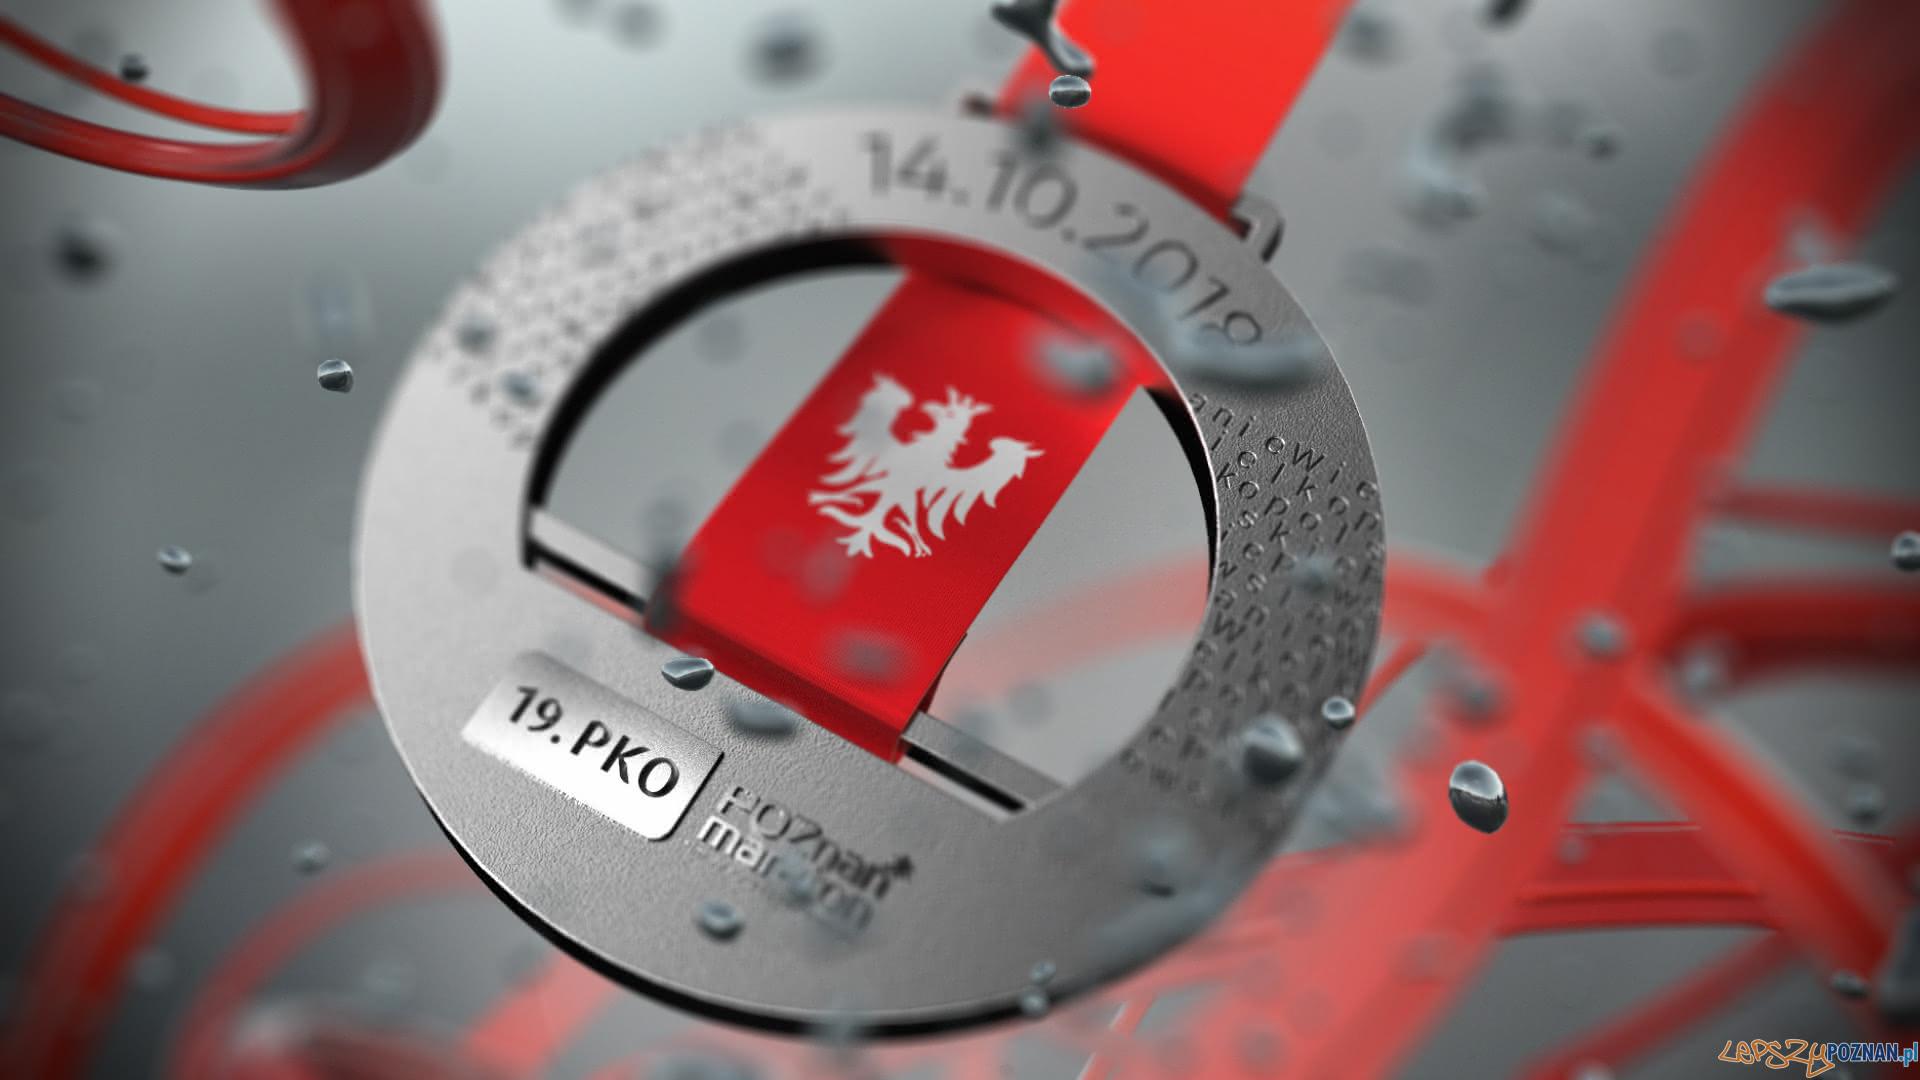 Medal 19. Poznań Maratonu  Foto: POSiR / materiały prasowe